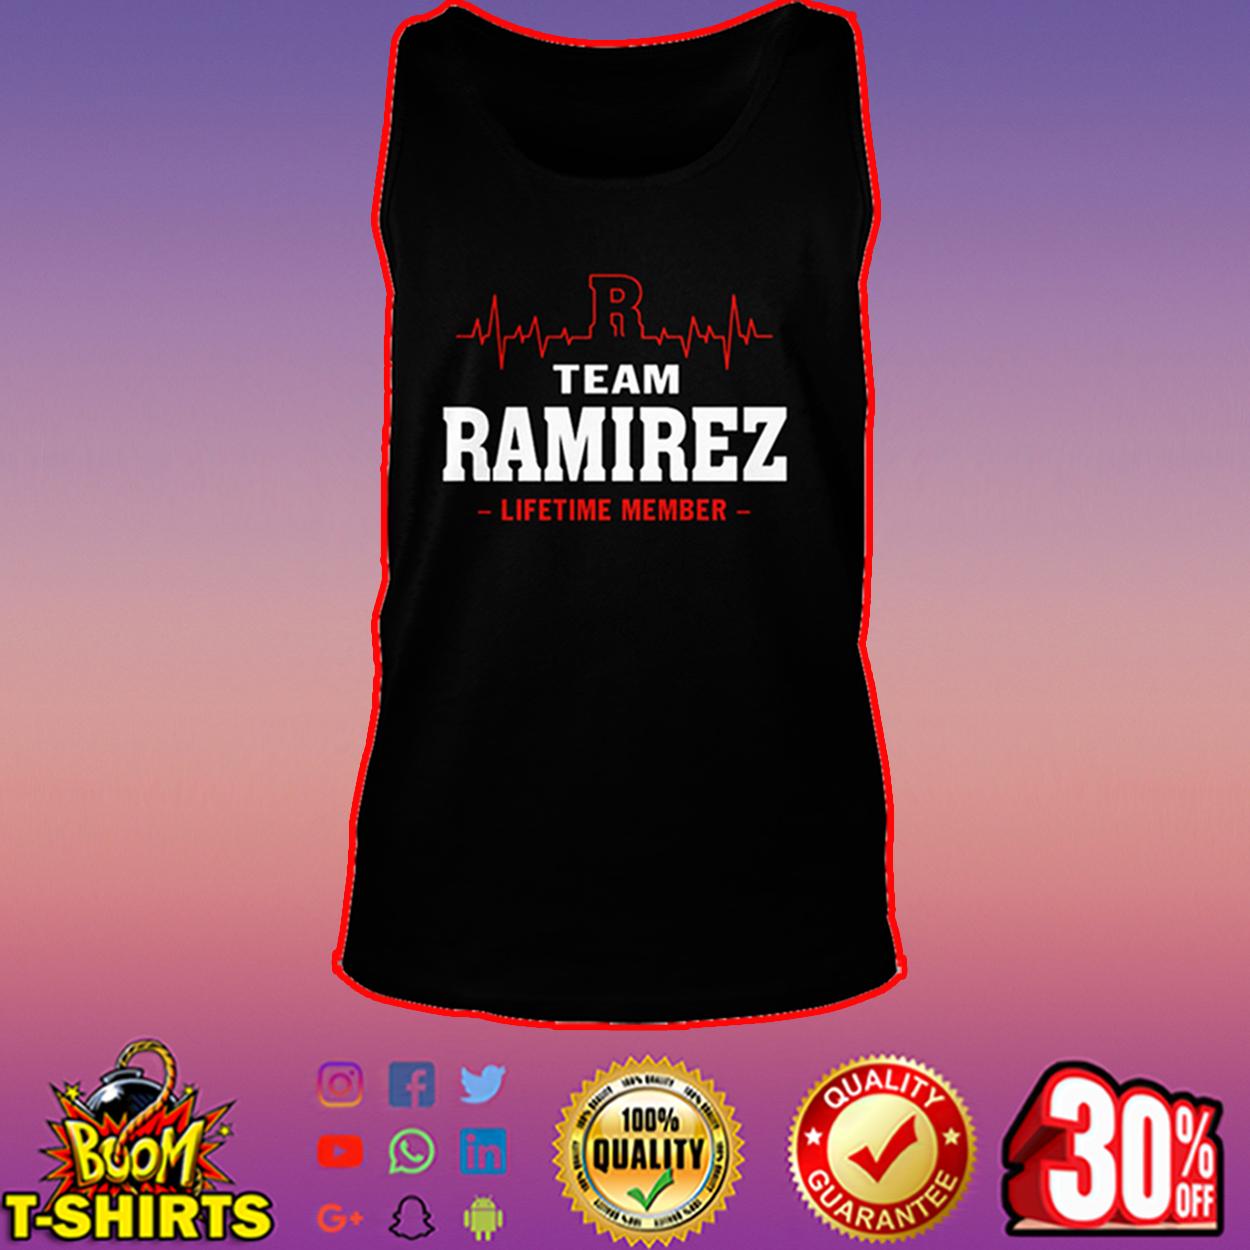 Team Ramirez lifetime member tank top